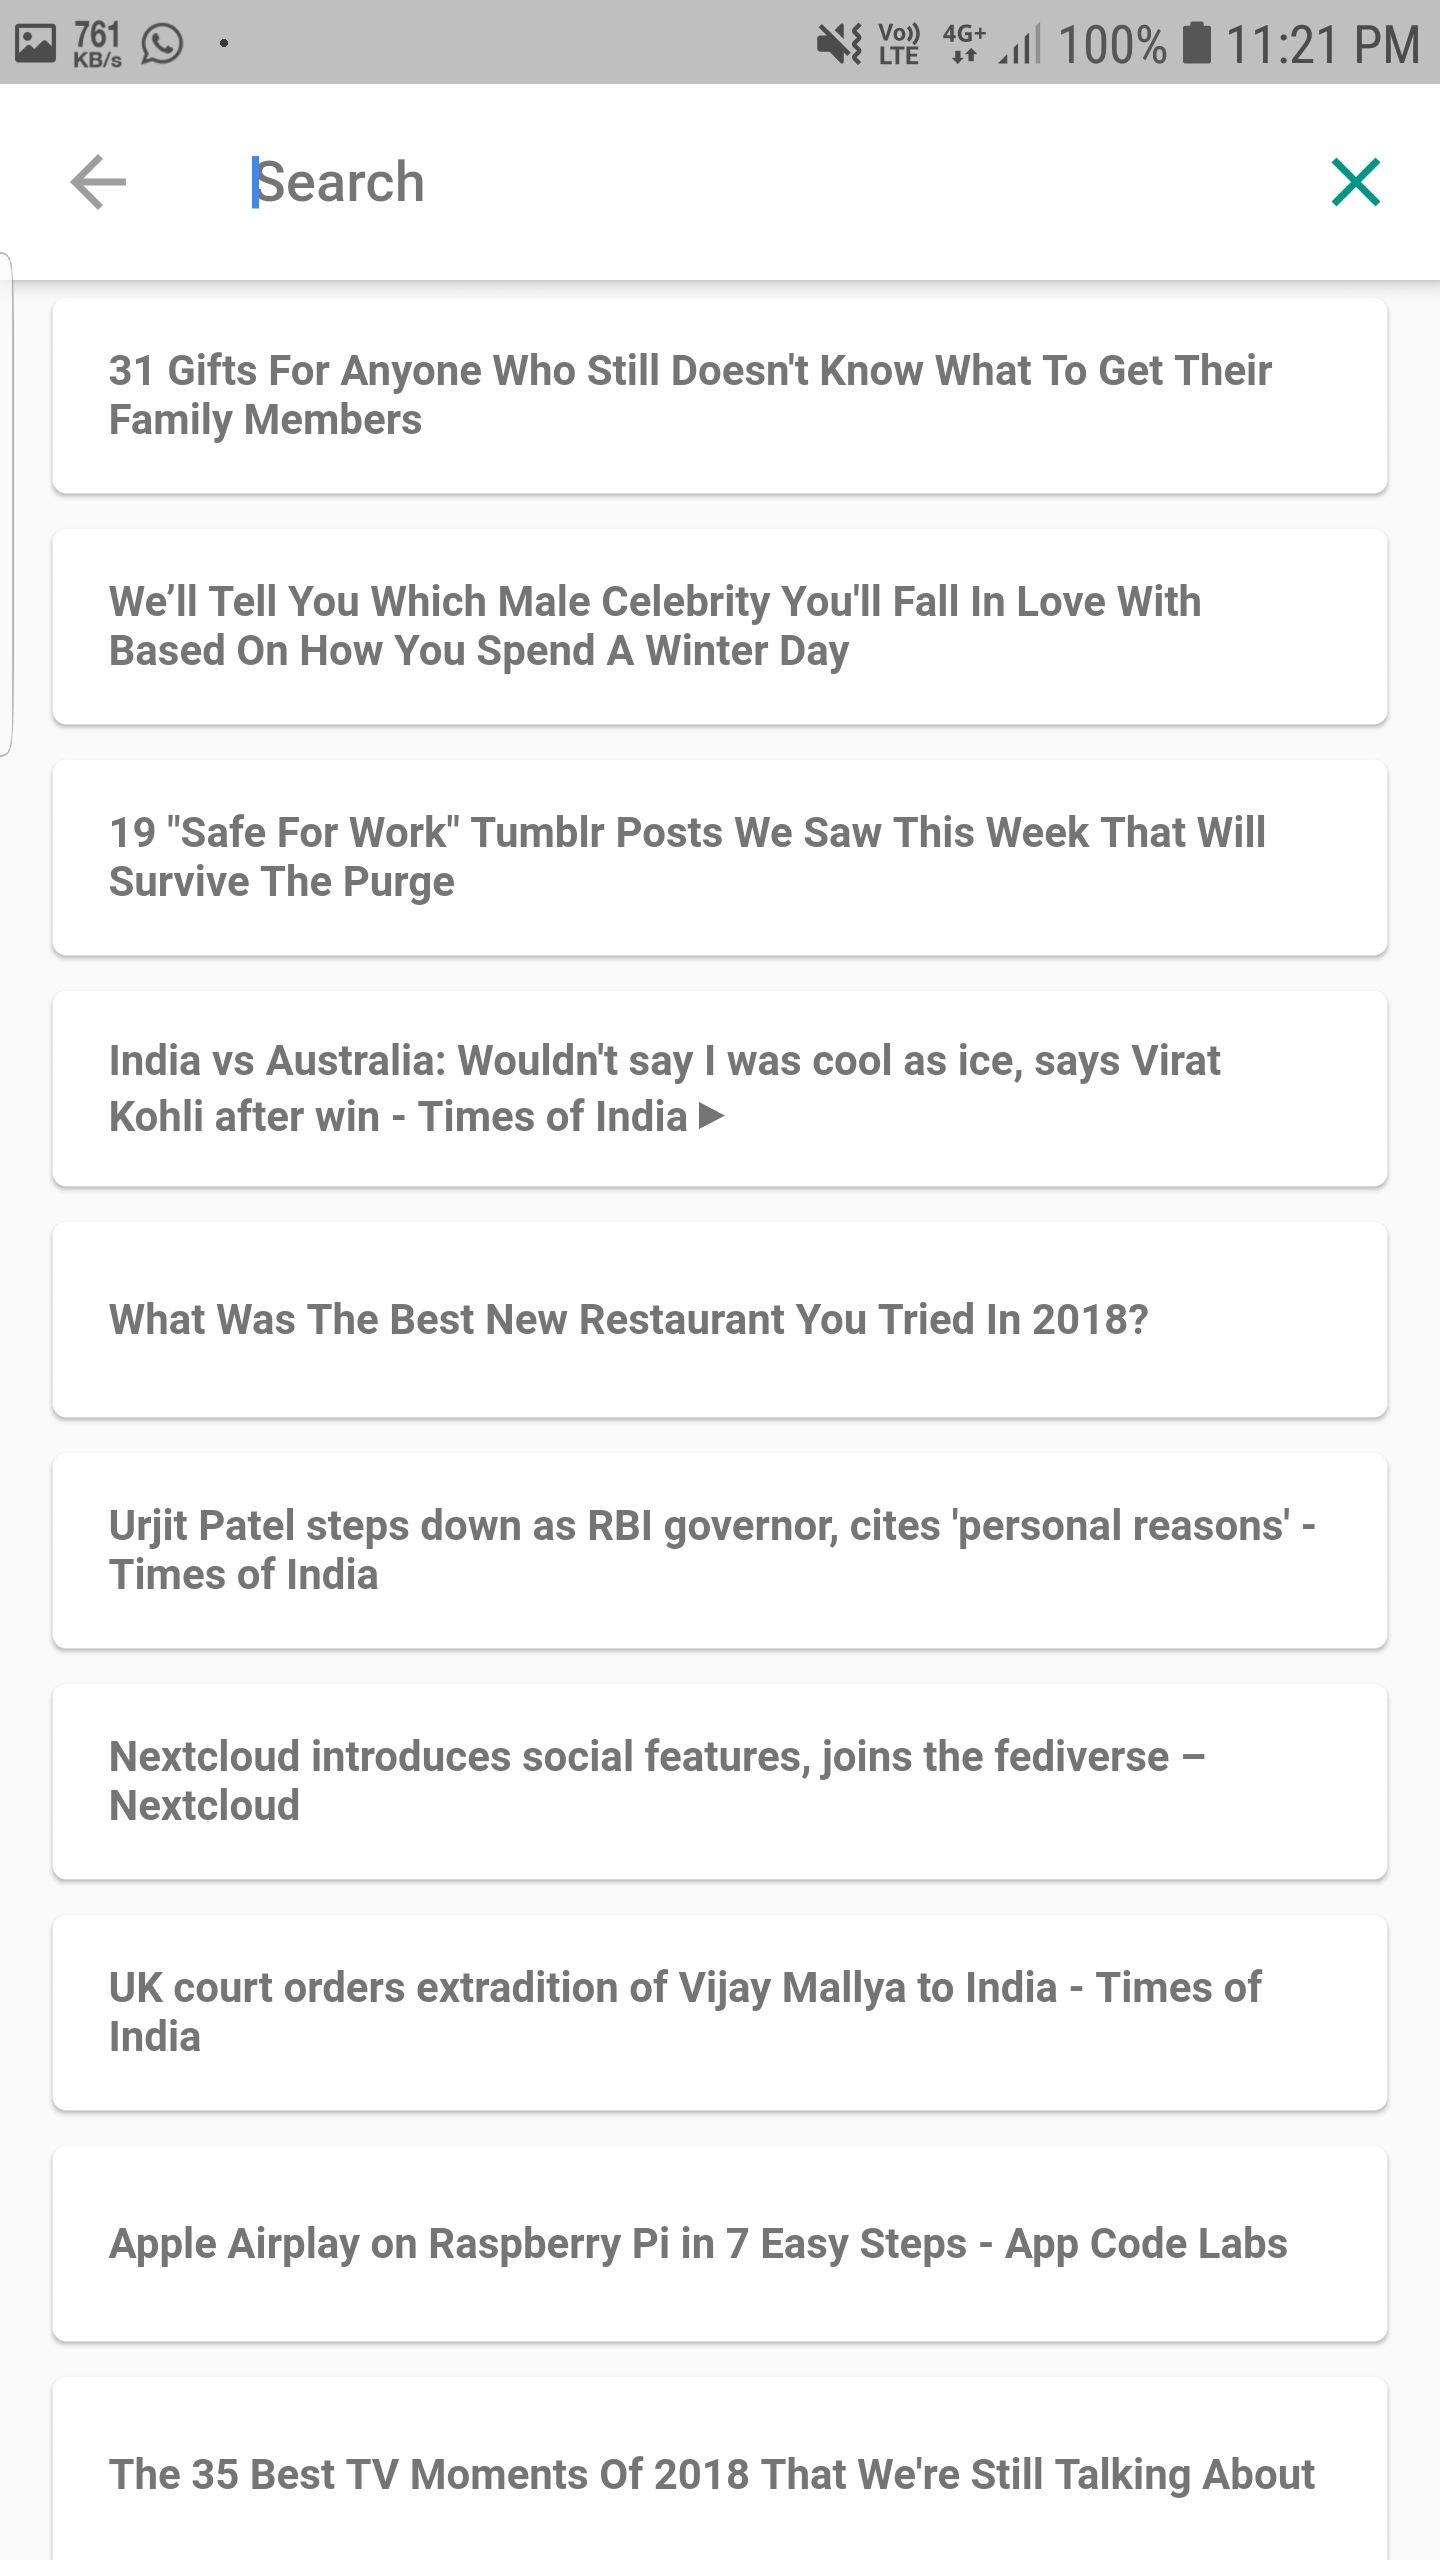 GitHub - SkullEnemyX/Wolfcry-NewsApp: Increment to the Chota